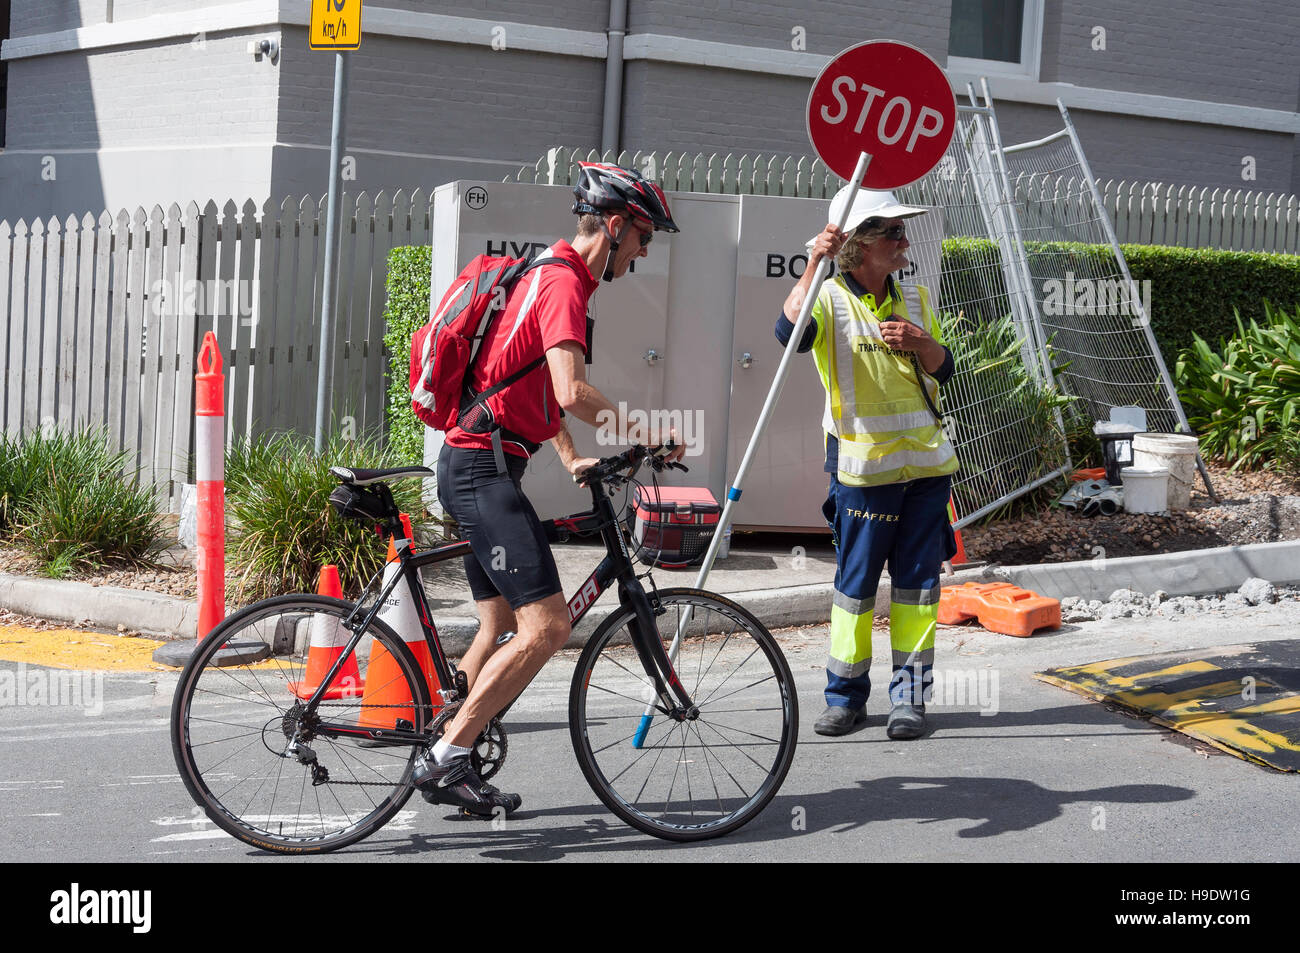 Cyclist waiting at roadworks stop sign, South Bank Parklands, Brisbane City, Brisbane, Queensland, Australia - Stock Image